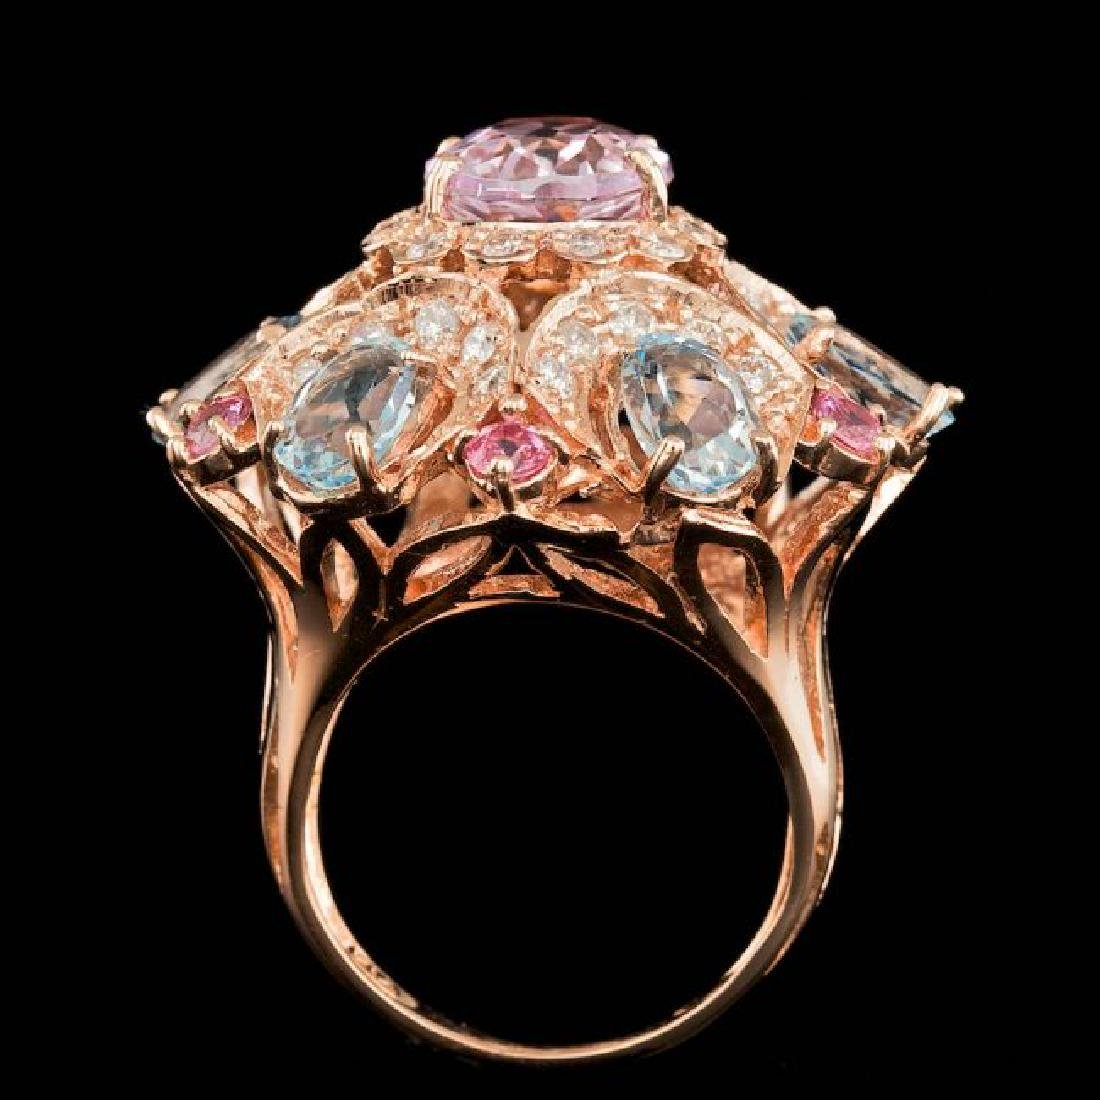 14k Rose Gold 3.50ct Kunzite 1.25ct Diamond Ring - 4